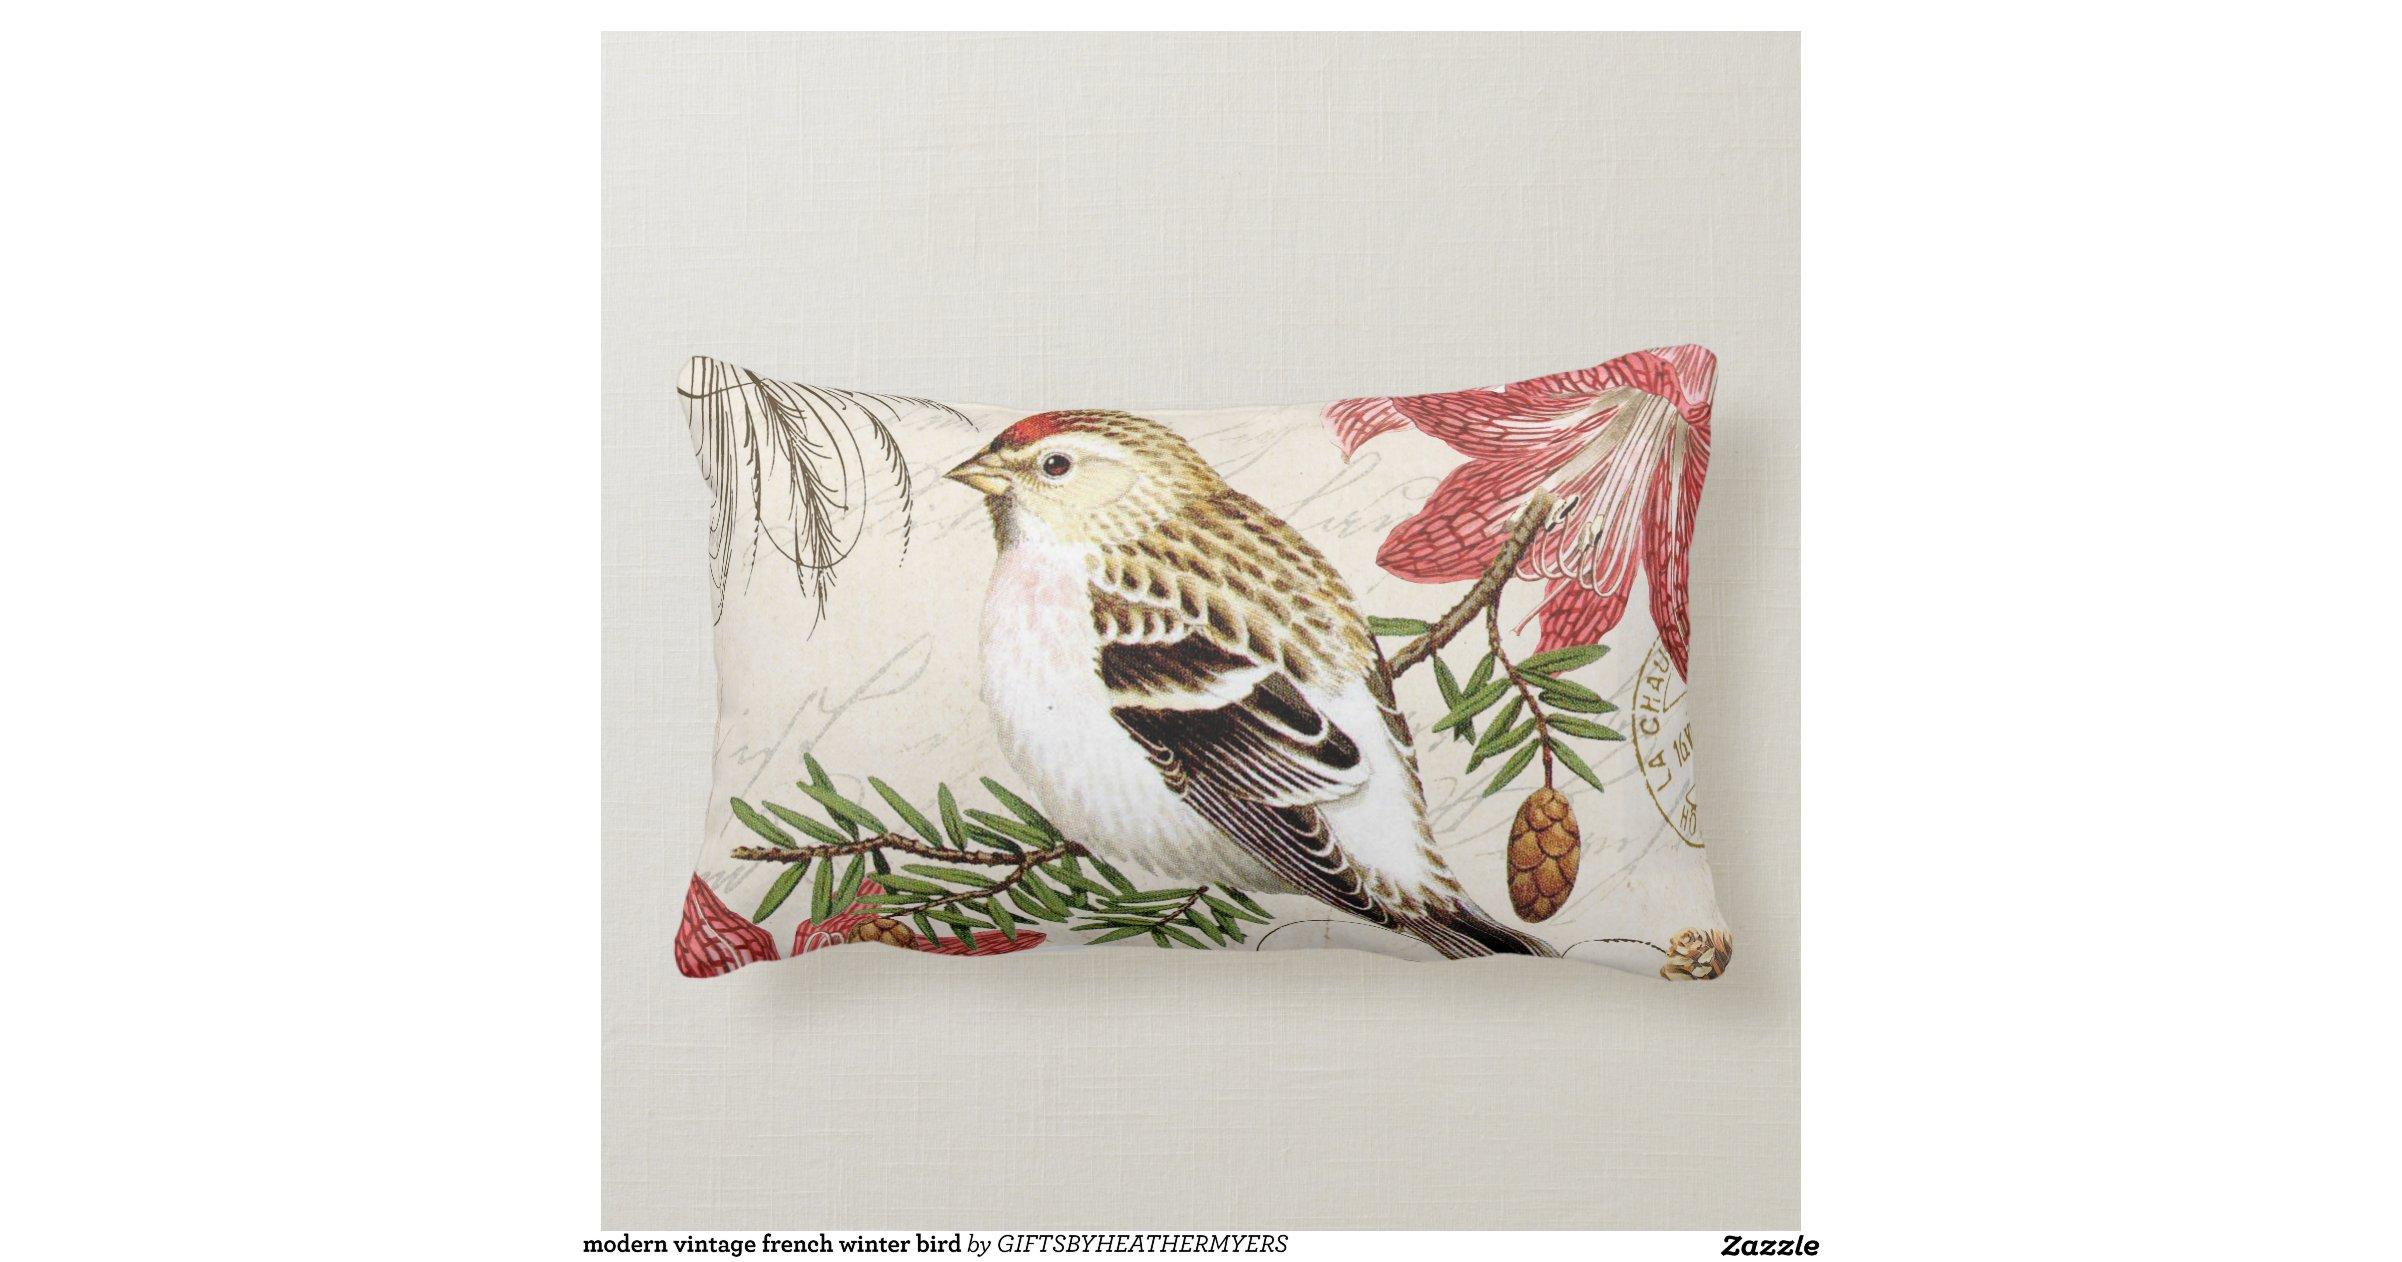 modern_vintage_french_winter_bird_throw_pillows-r81c1386cc3e6456da440d7d3347f0e89_2i4t2_8byvr ...